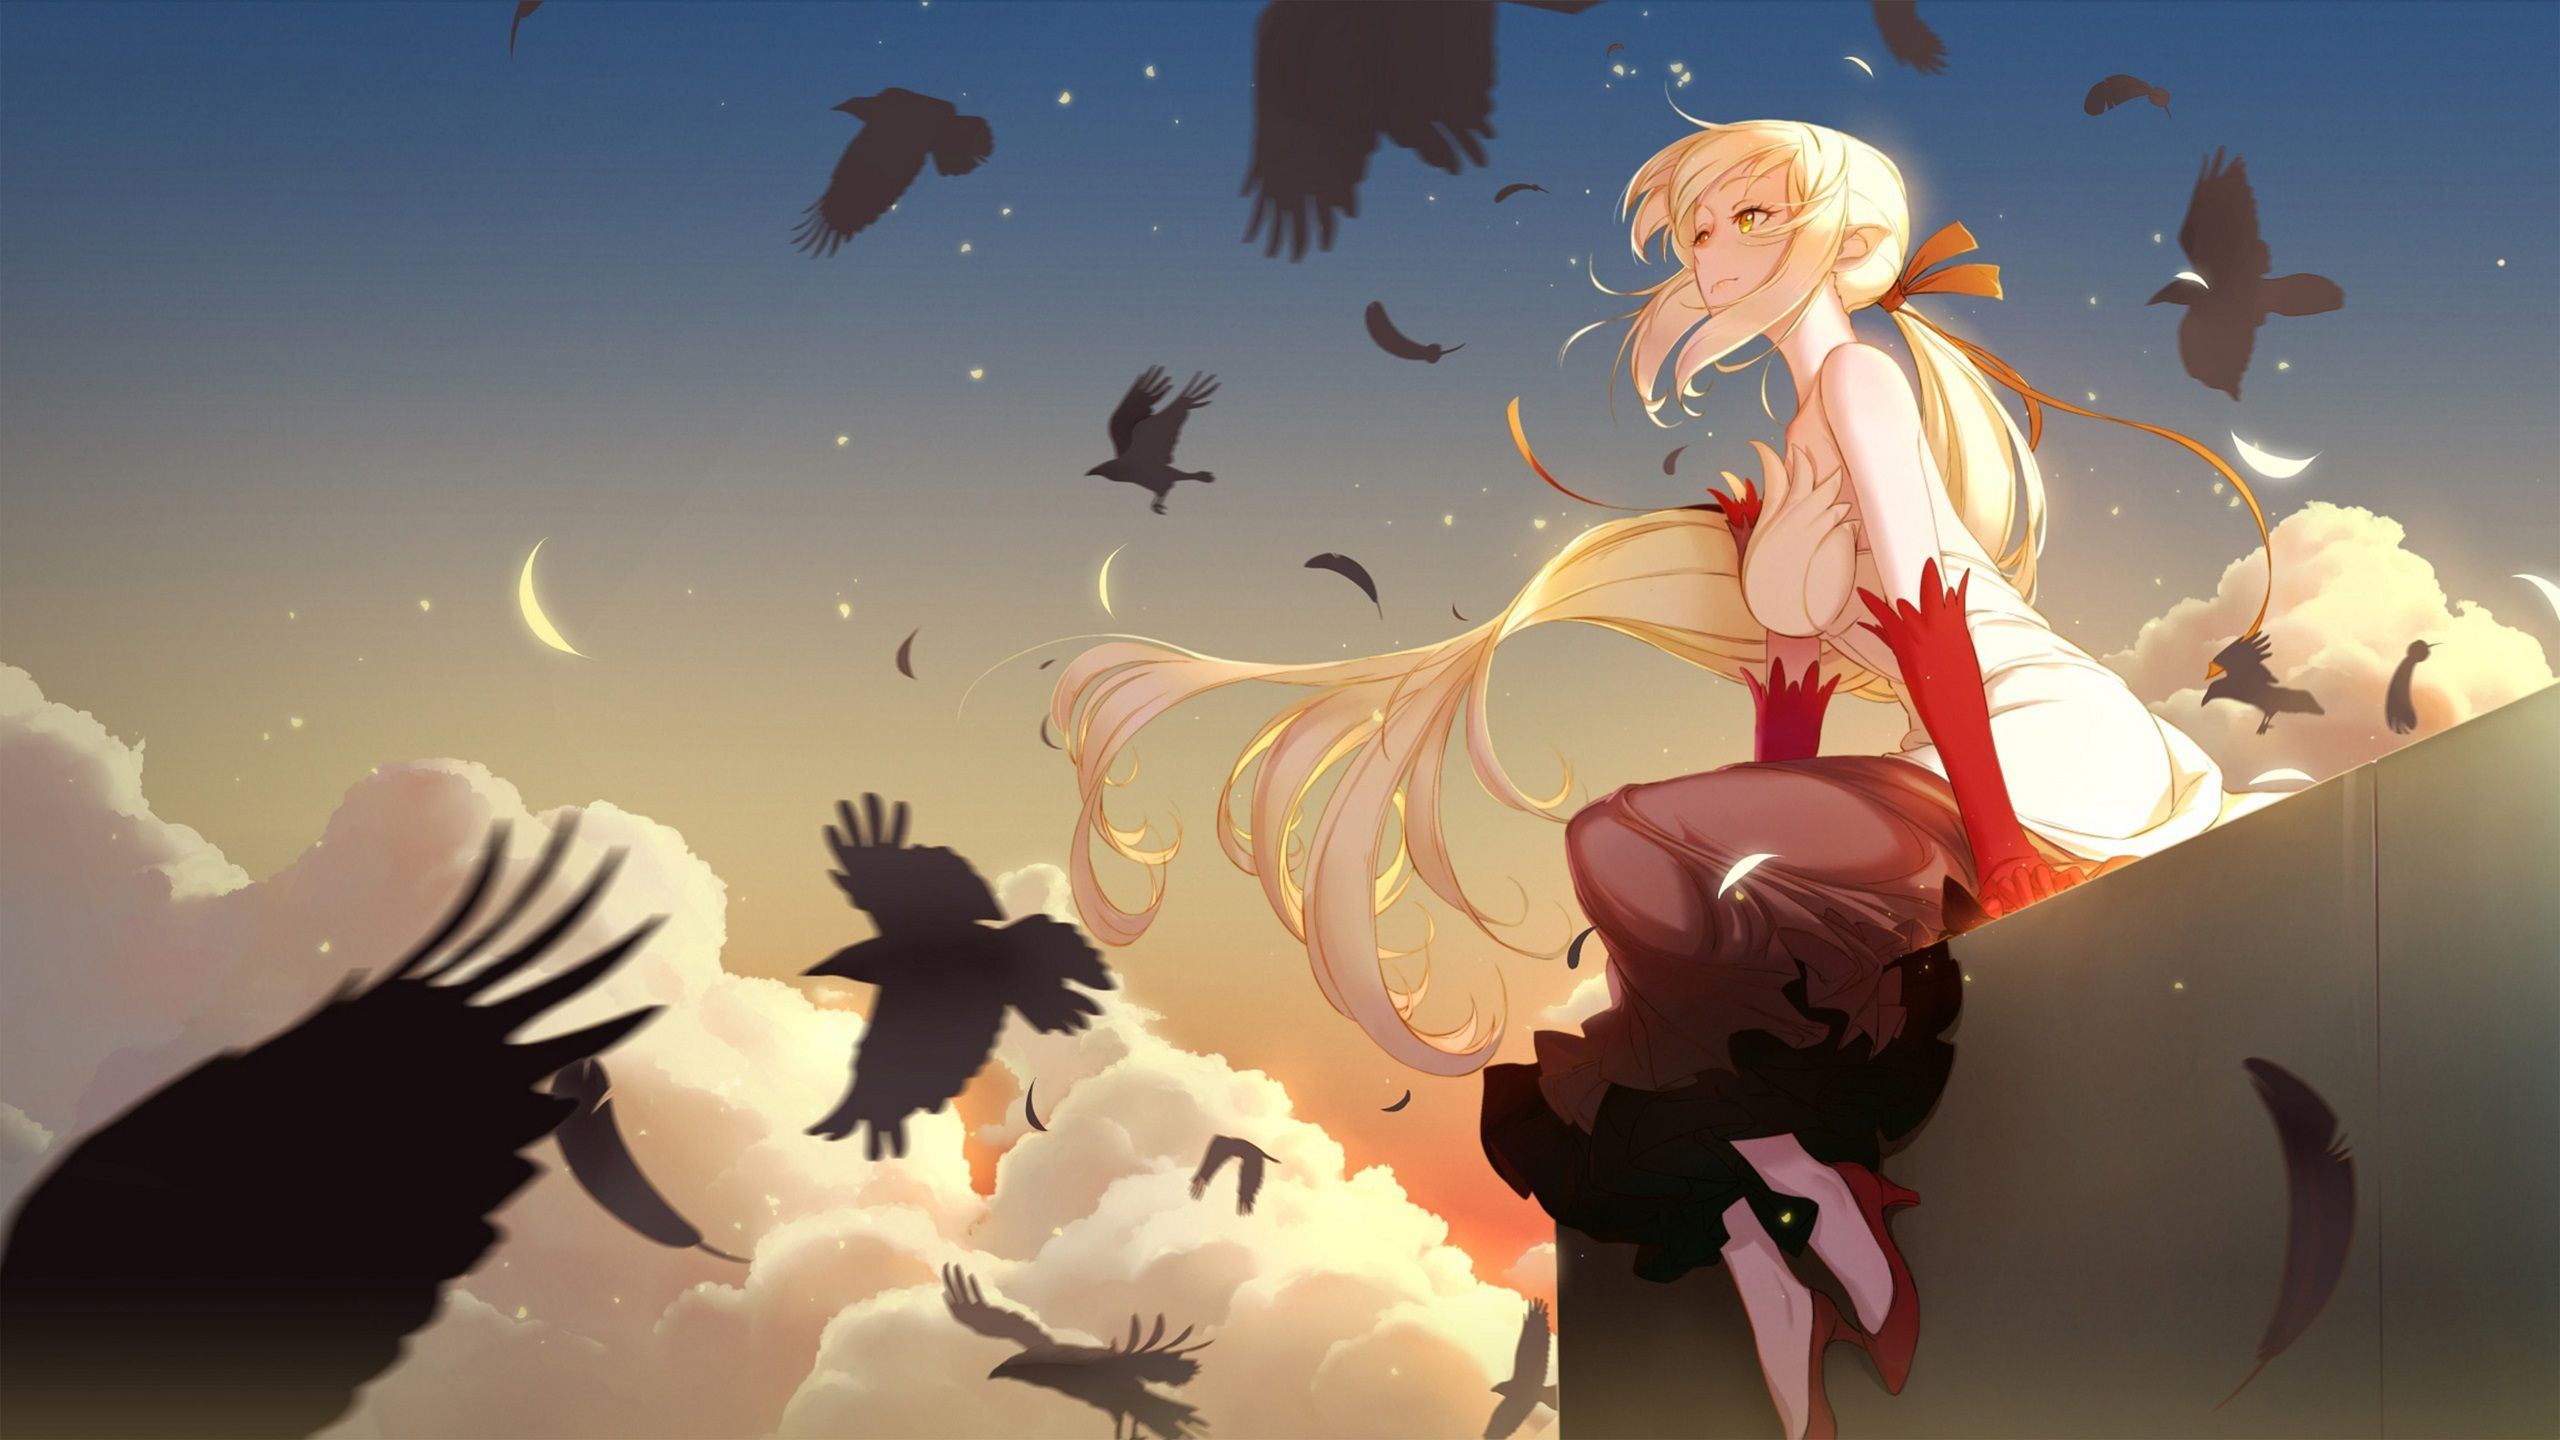 Shinobu2560x1440 Hd Wallpaper From Gallsourcecom Anime Art